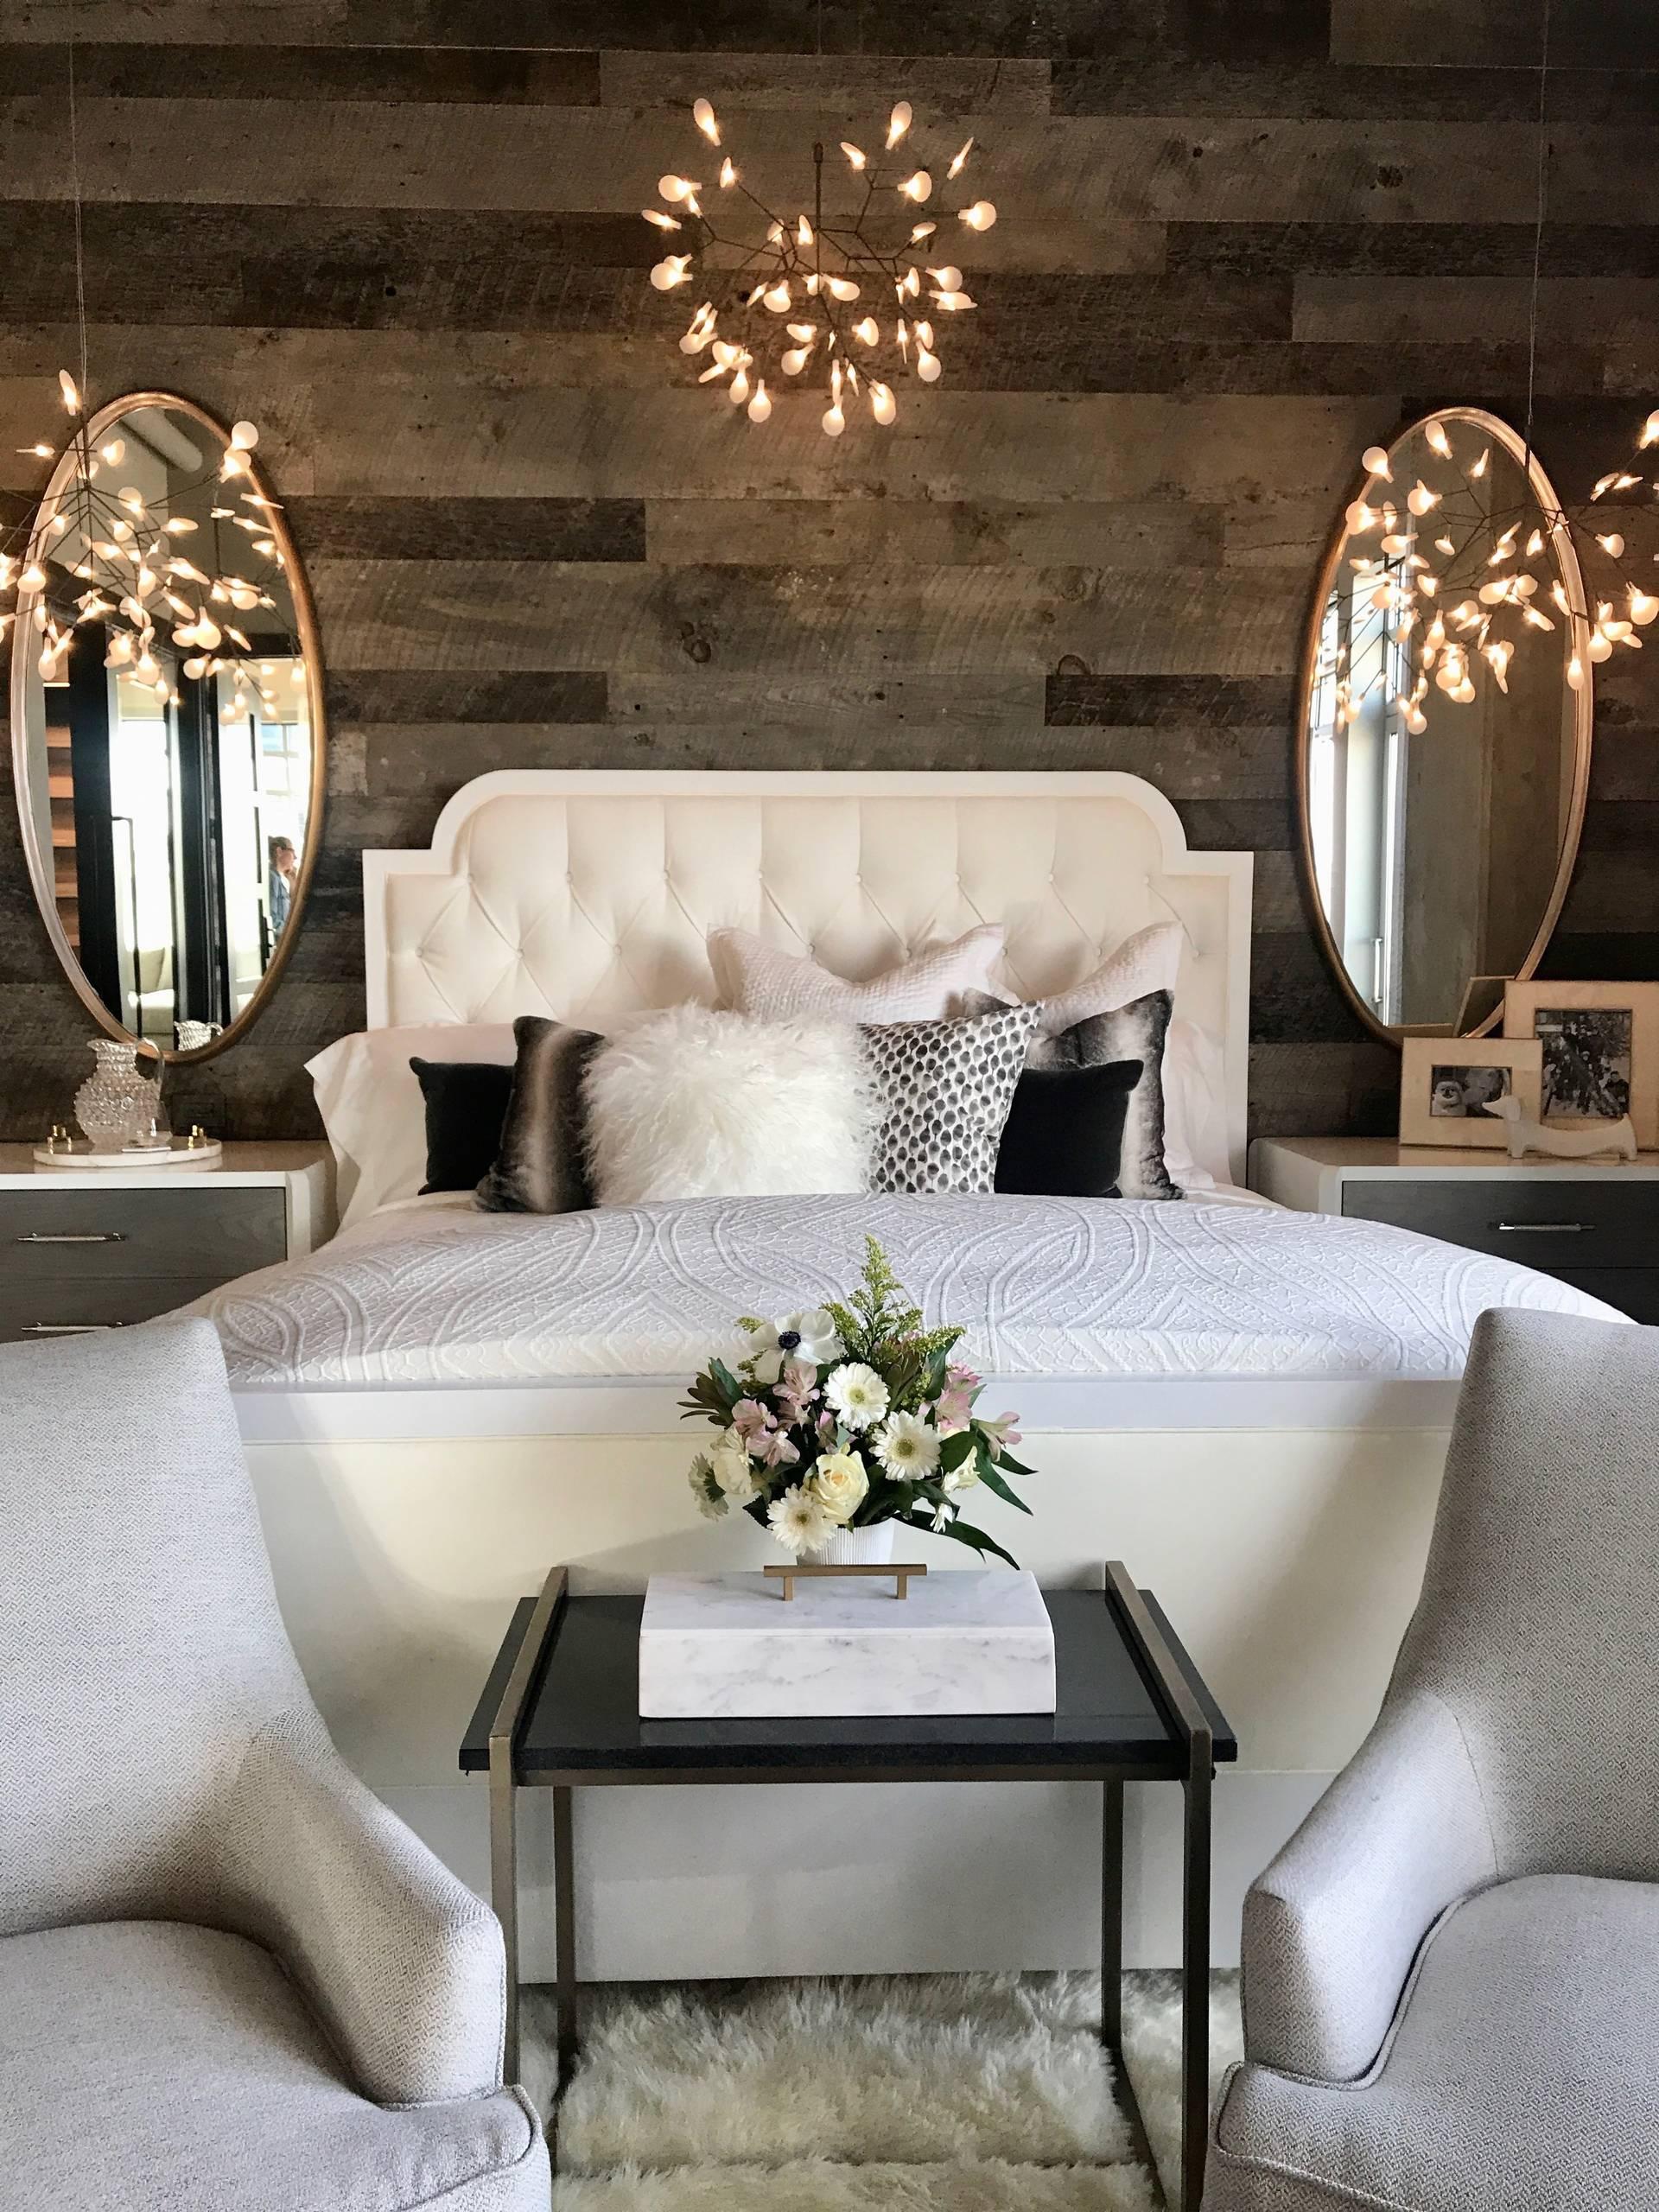 Denver Colorado Residence | Beautiful Bedroom Design